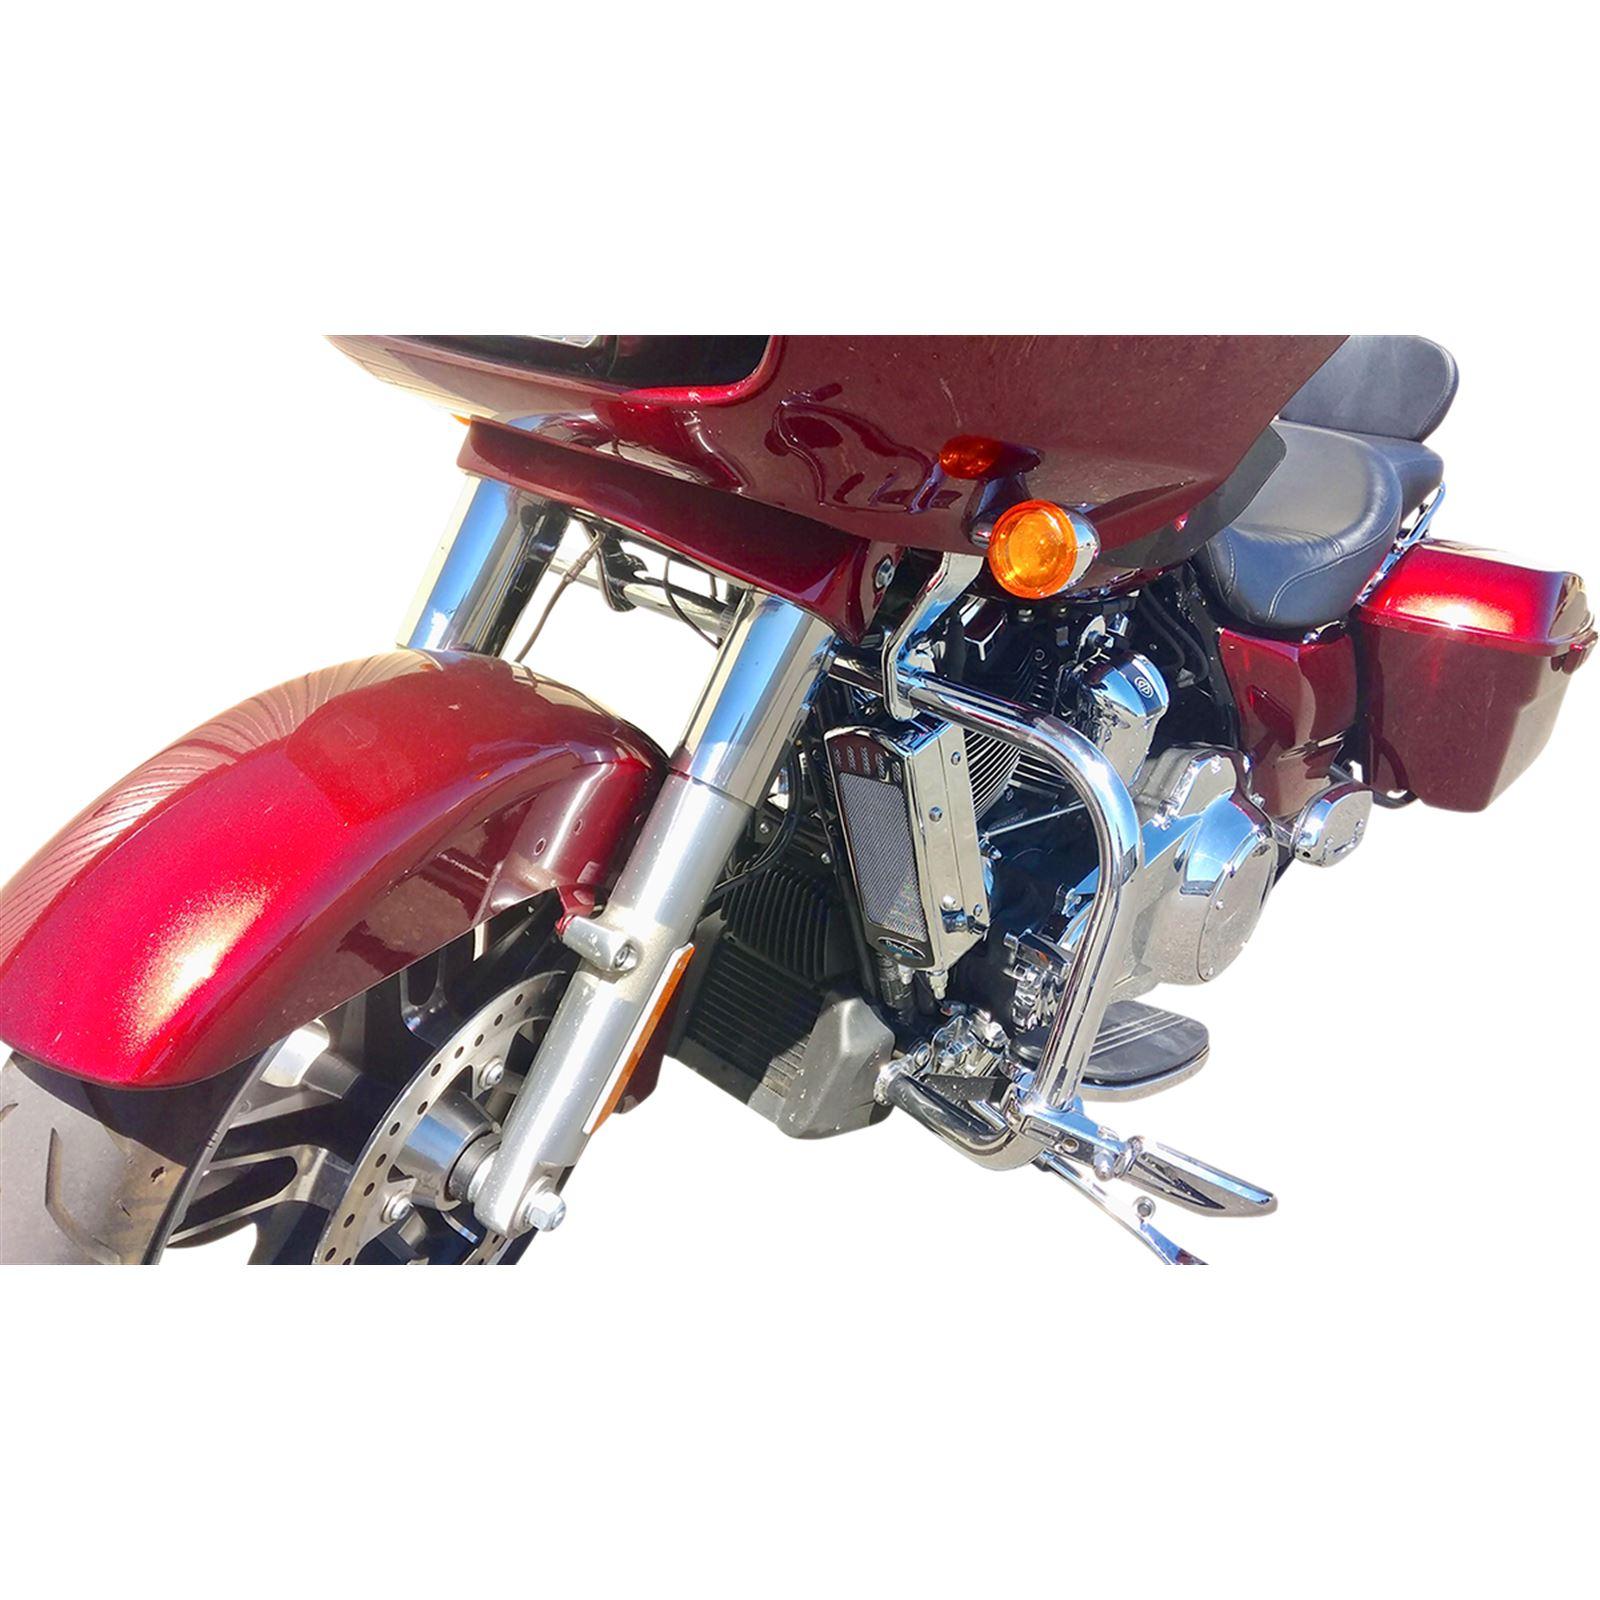 Ultracool Oil Cooler Kit - Chrome - Frame Mount - M8 Oil Cooled